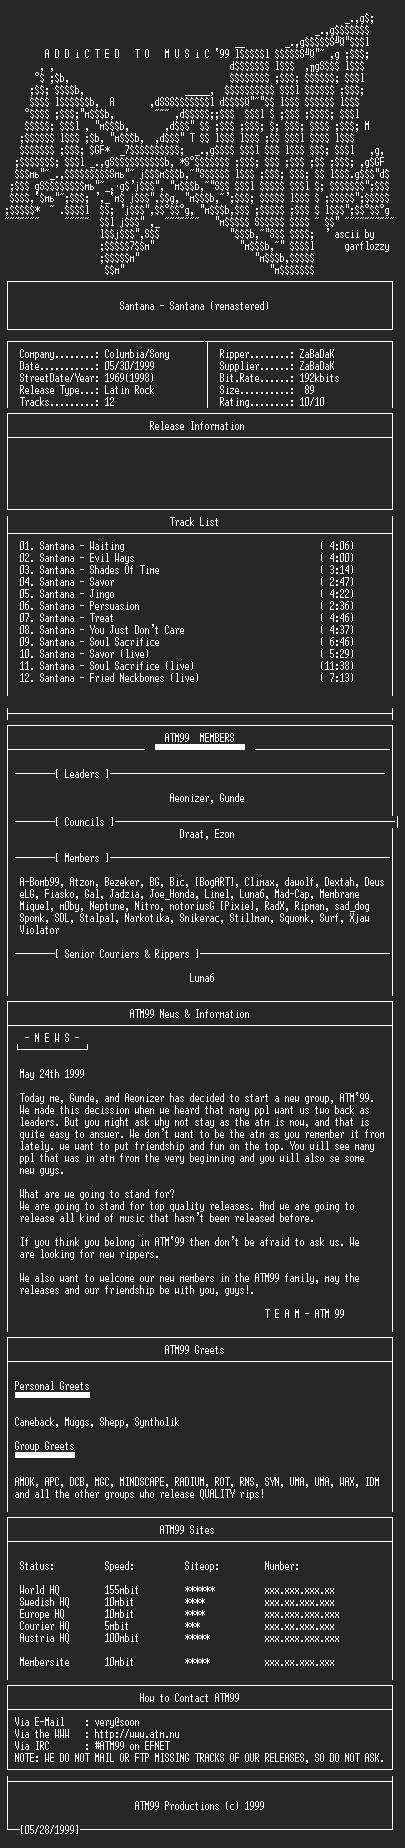 NFO file for Santana_-_Santana_-_(1969)_(Remast.)-ATM99